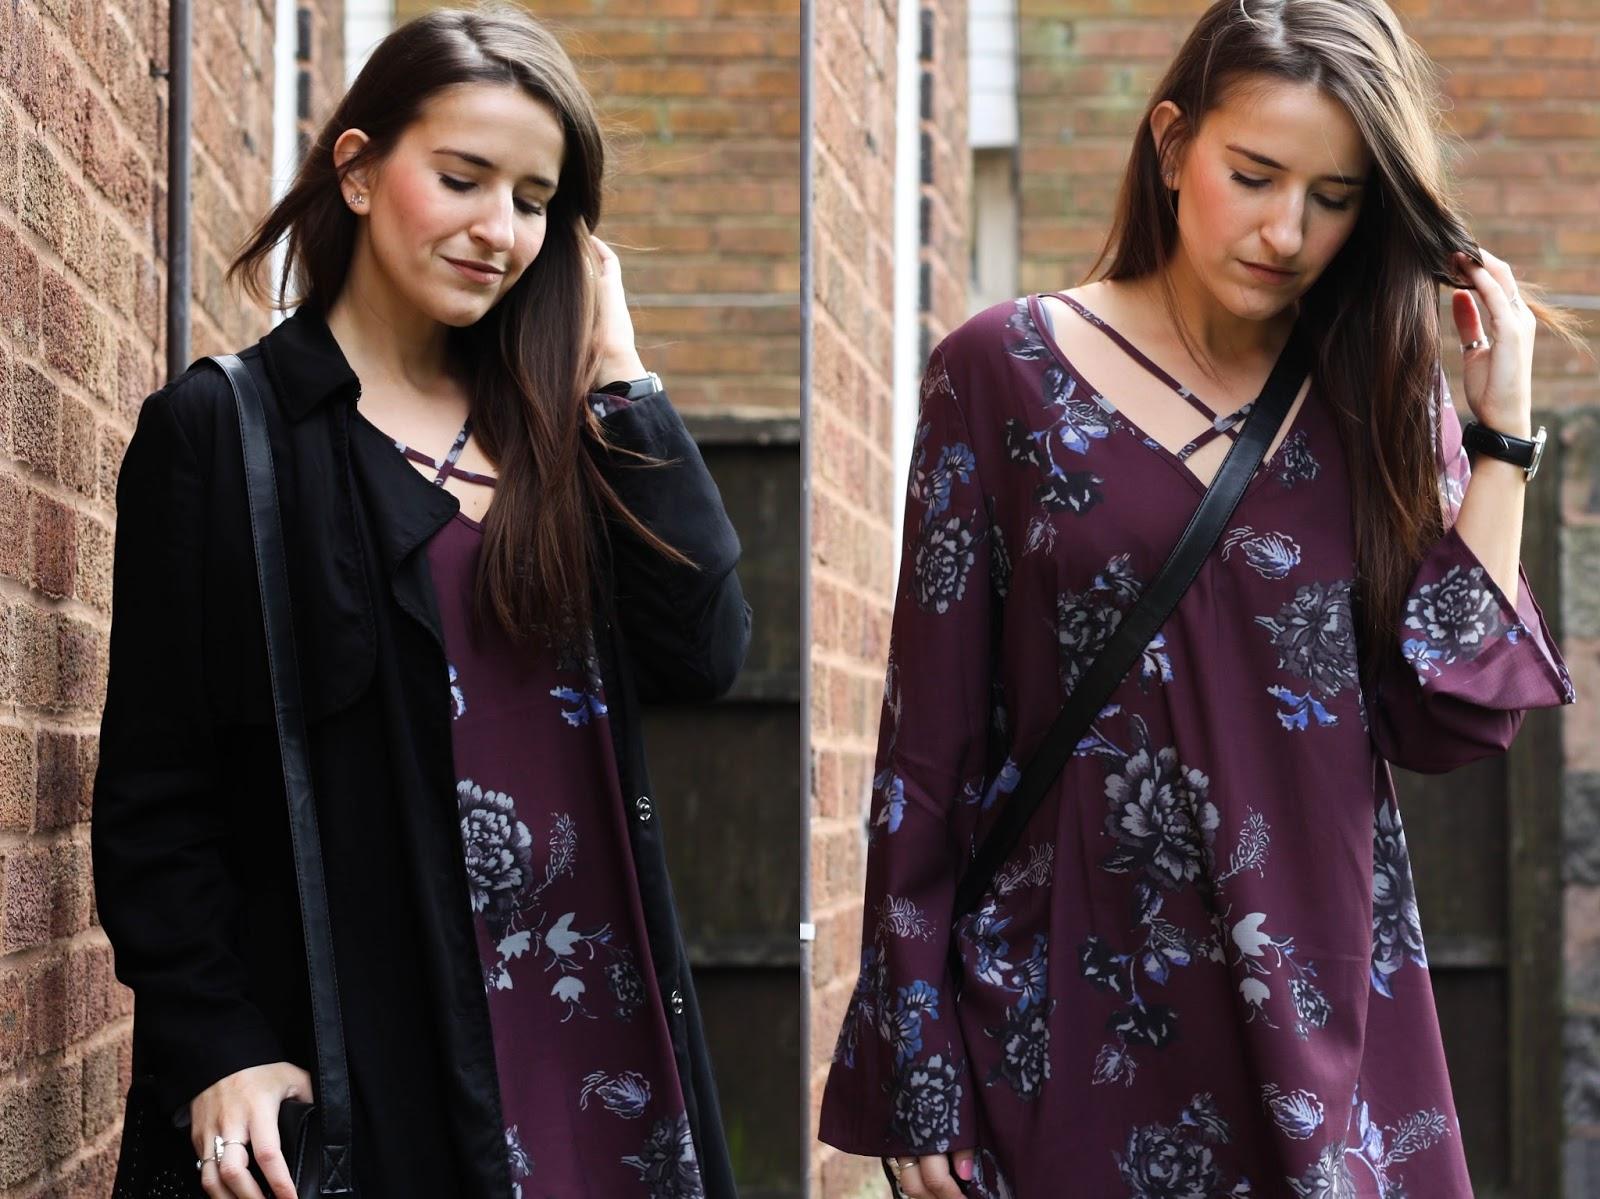 SheIn purple floral boho dress